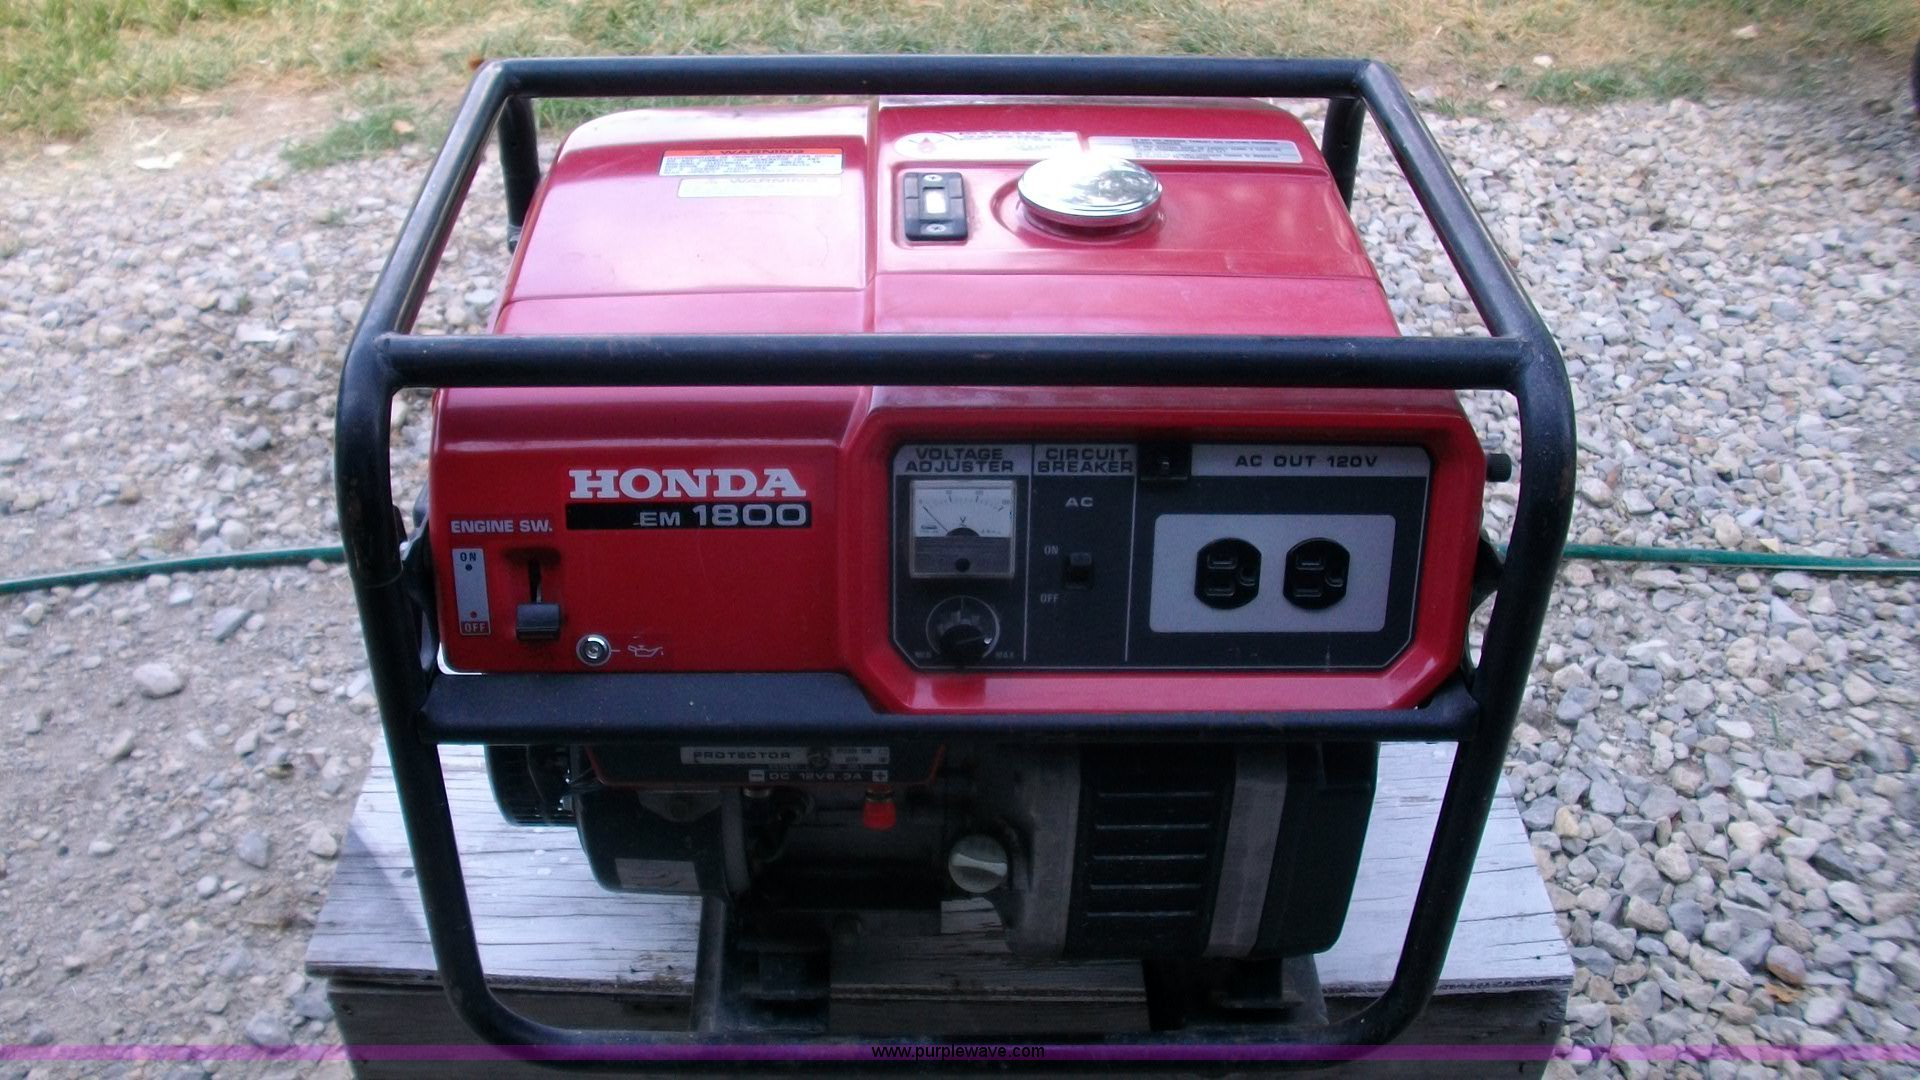 Honda EM1800 portable generator Item B1434